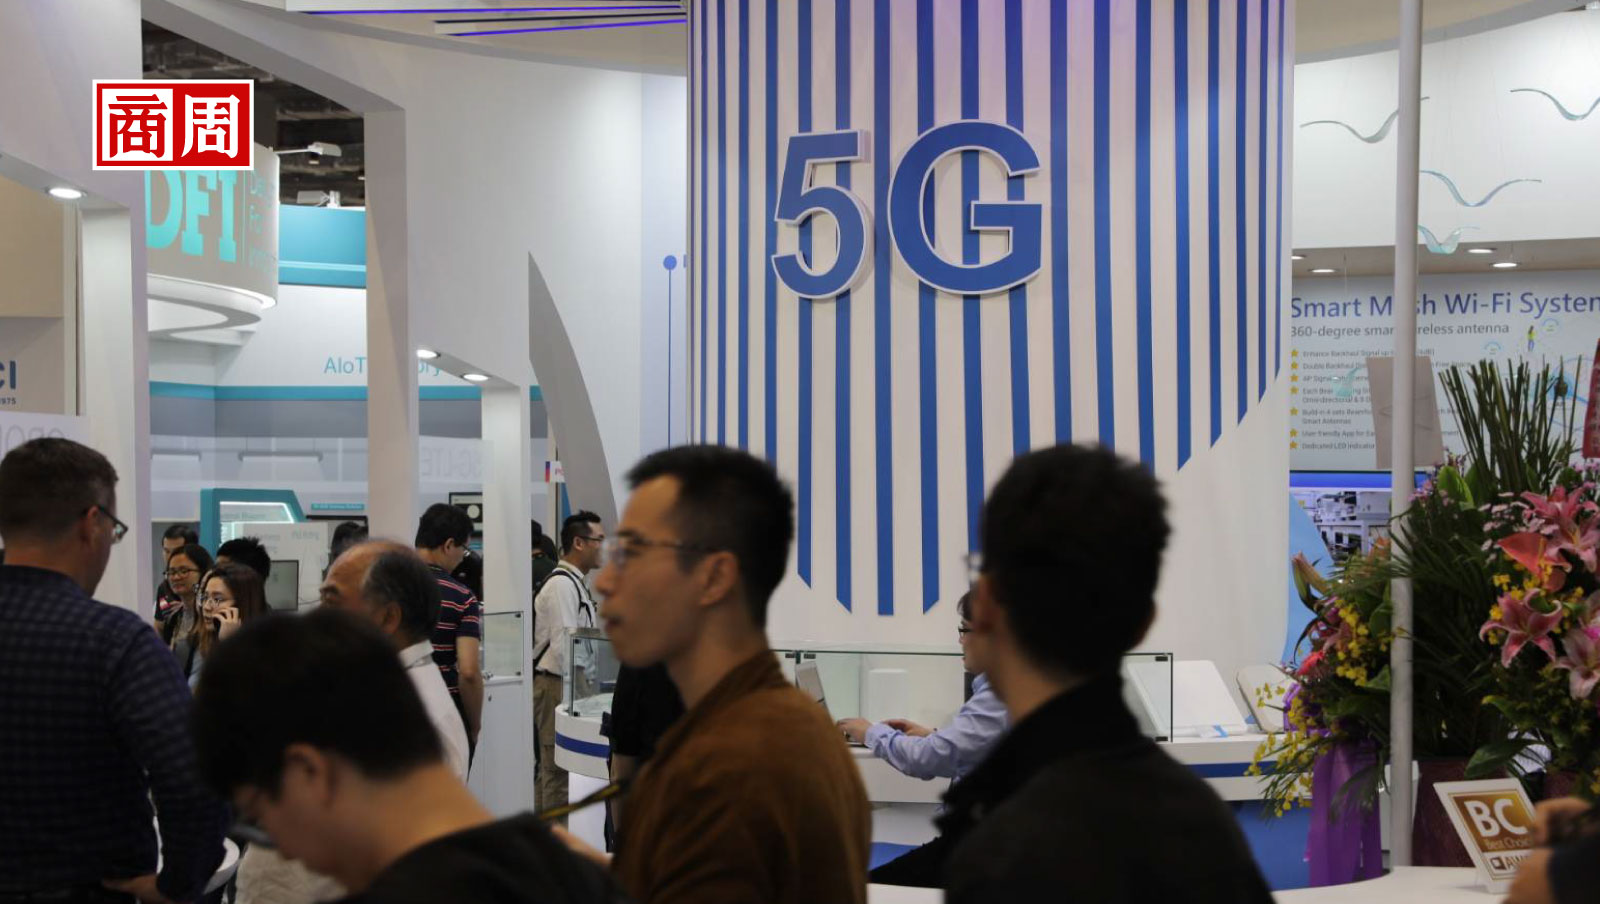 5G筆電現身,PC市場復活了?連手機晶片廠也做電腦,看懂今年Computex最火商機